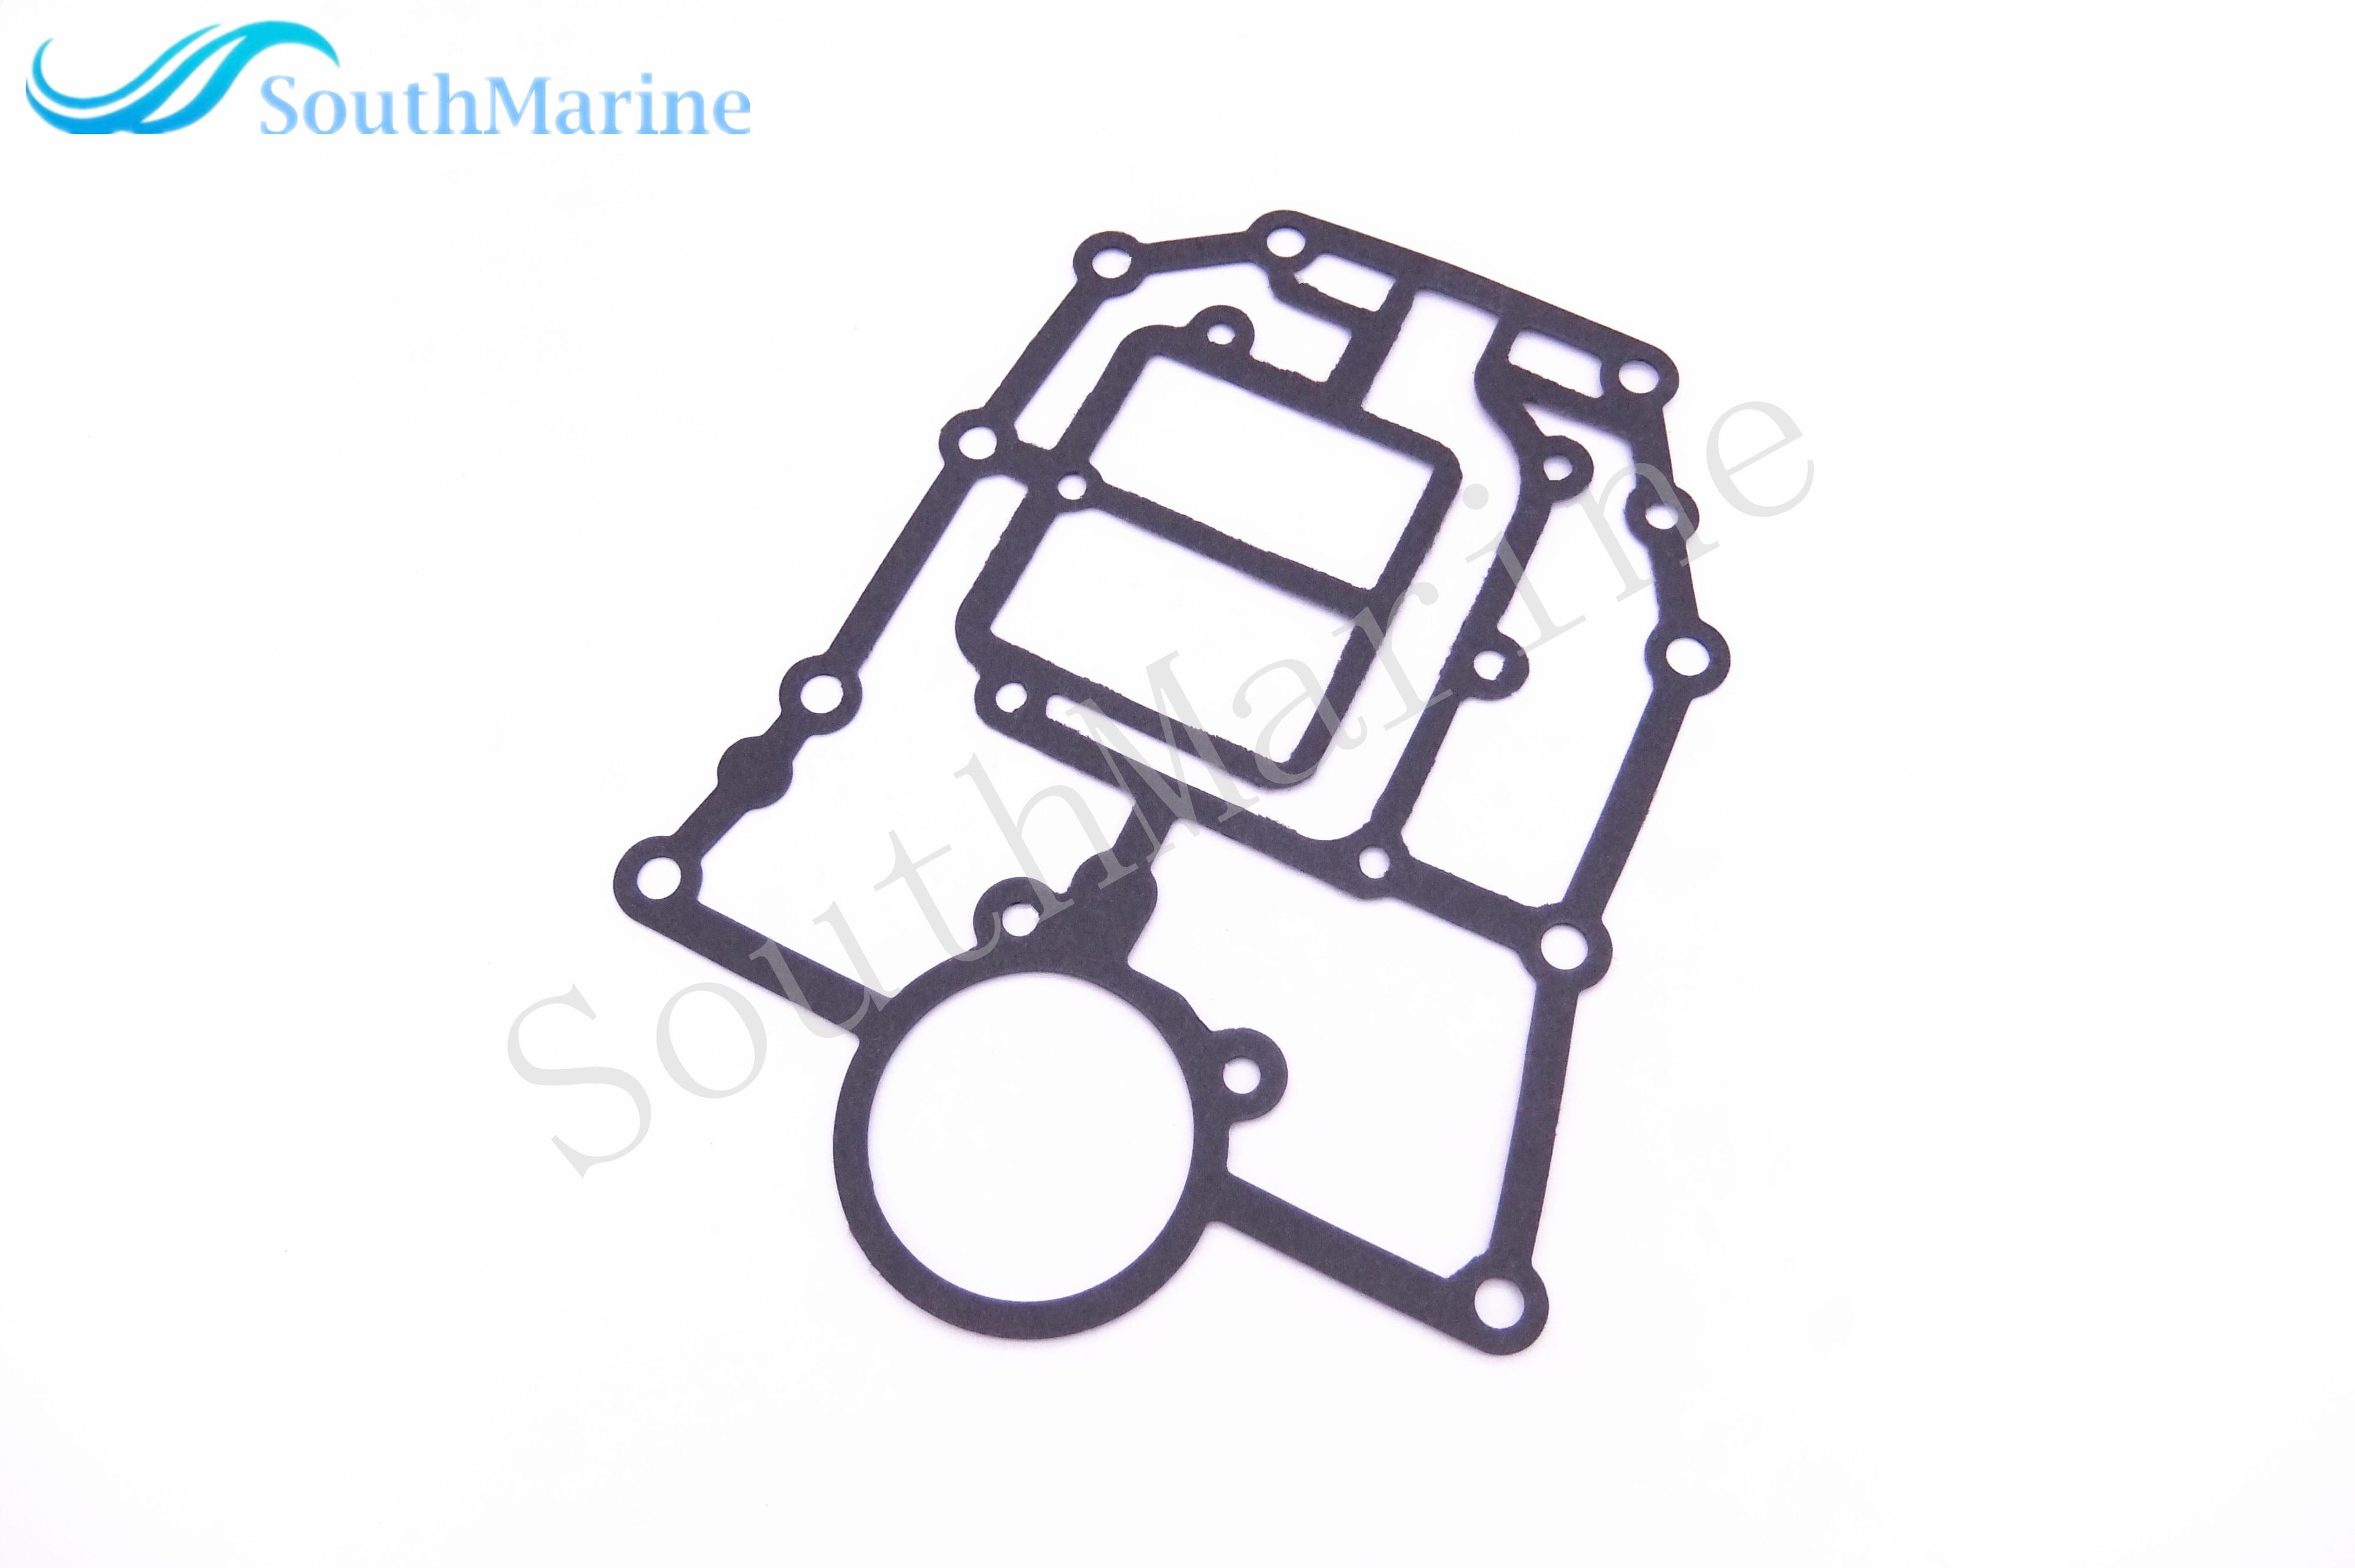 medium resolution of 11433 94412 boat motor gasket under oil seal for suzuki 40hp dt40 outboard engine 11433 94411